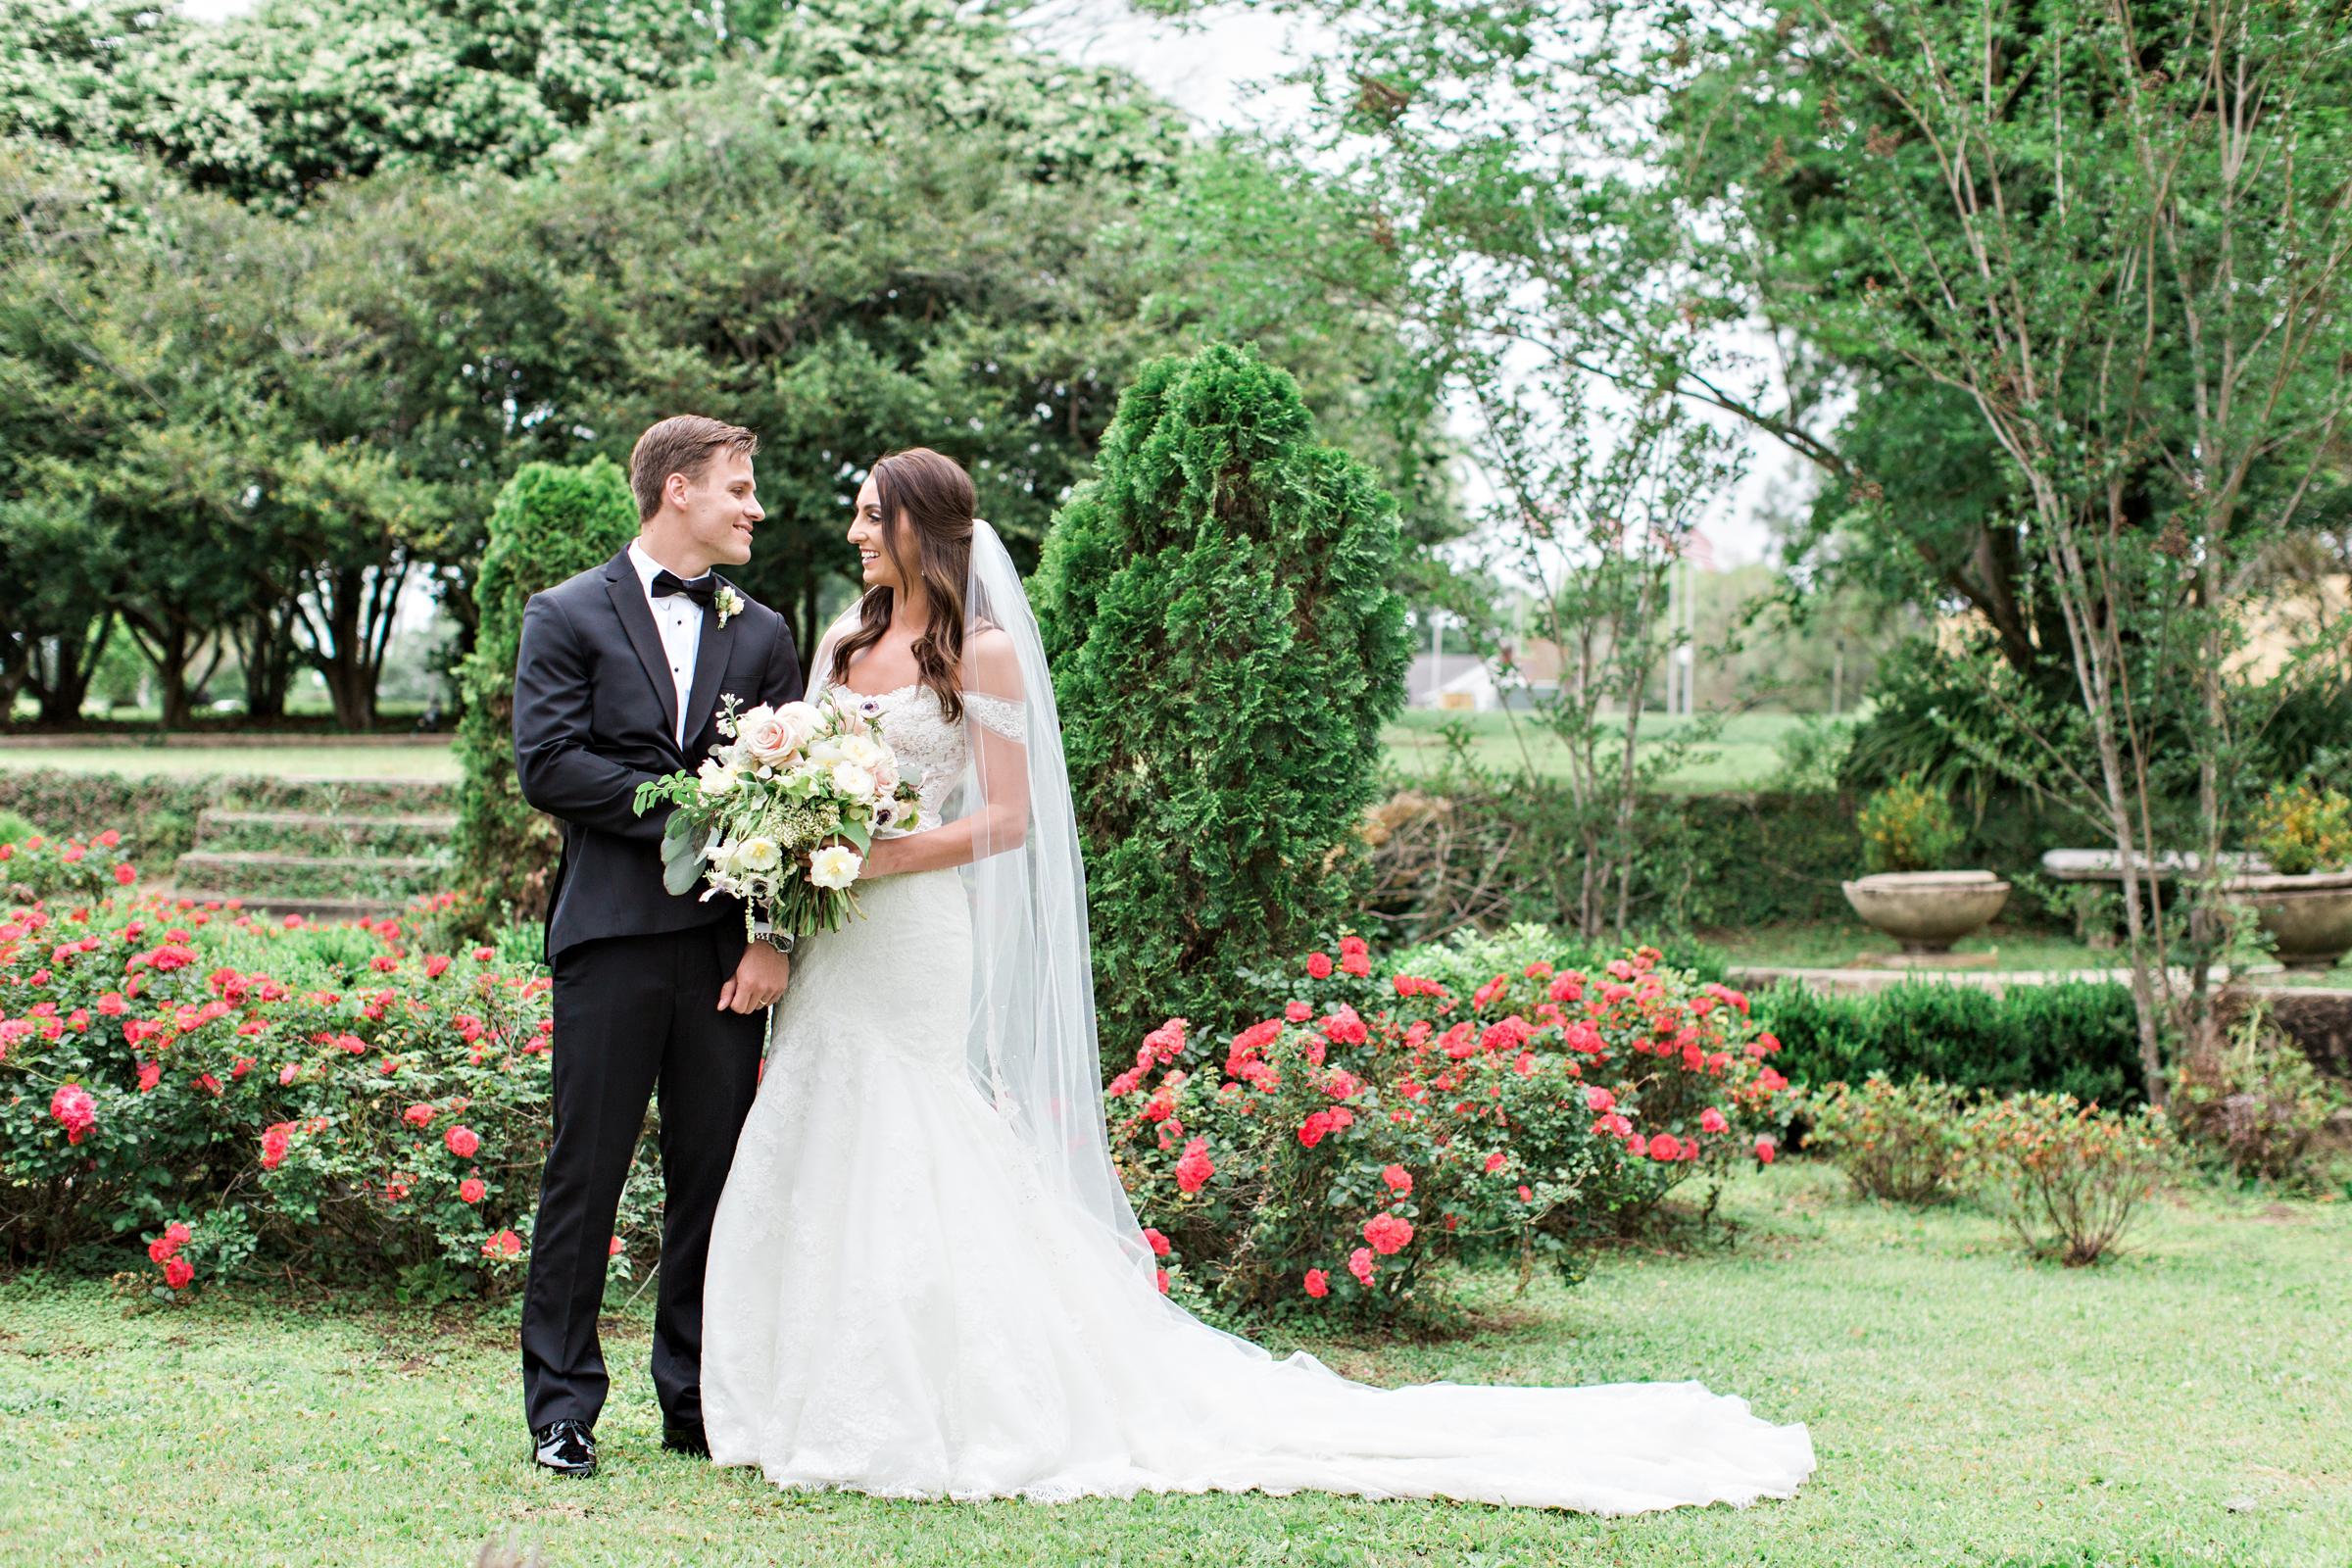 Matty-Drollette-Montgomery-Alabama-Wedding-Photography-152.jpg